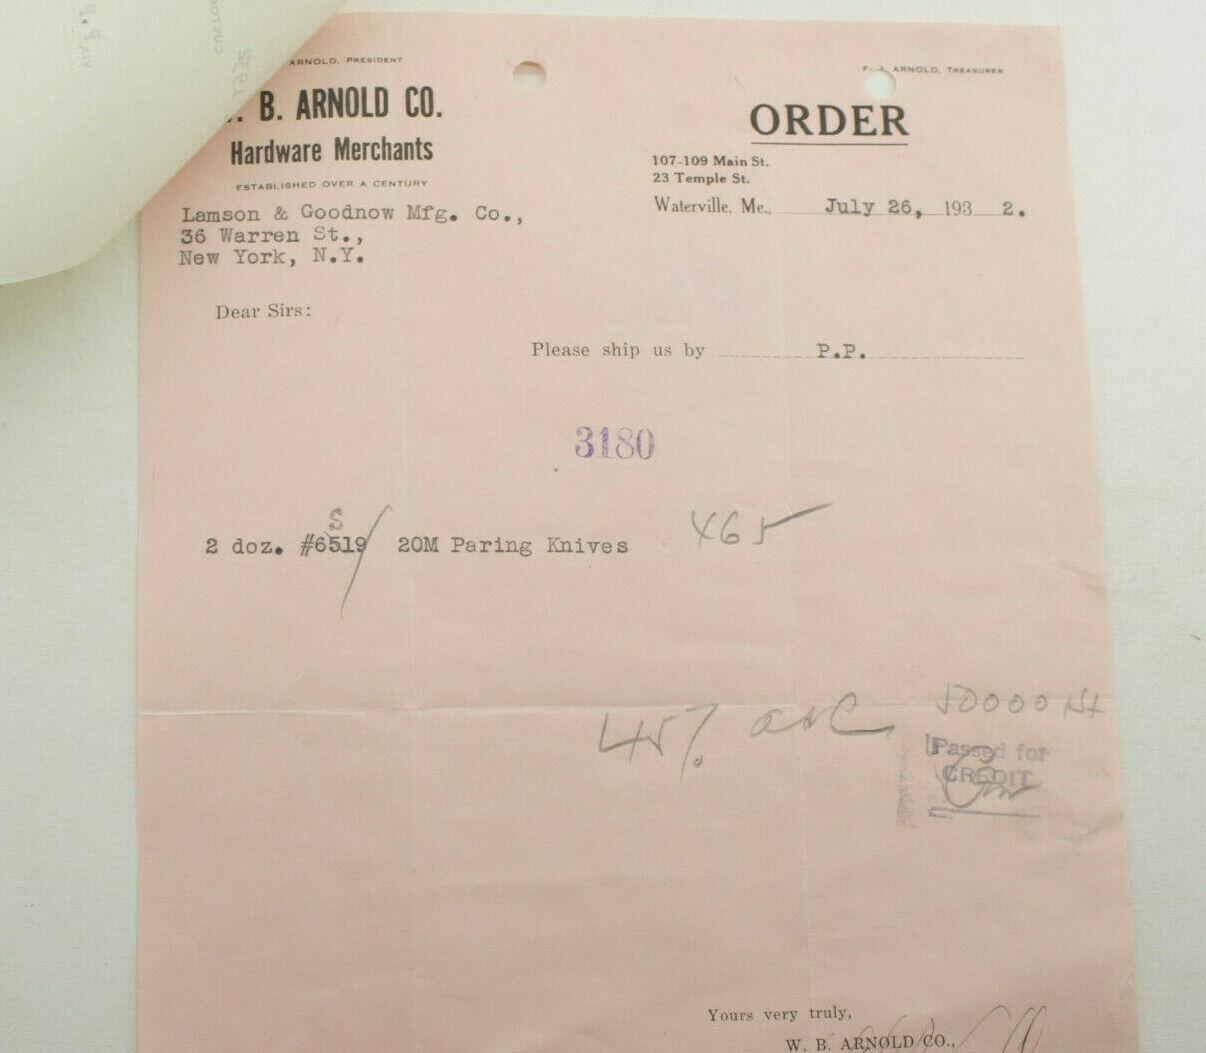 1932 Lamson Goodnow W B Arnold Co Waterville ME Paring Knives Ephemera P1505B